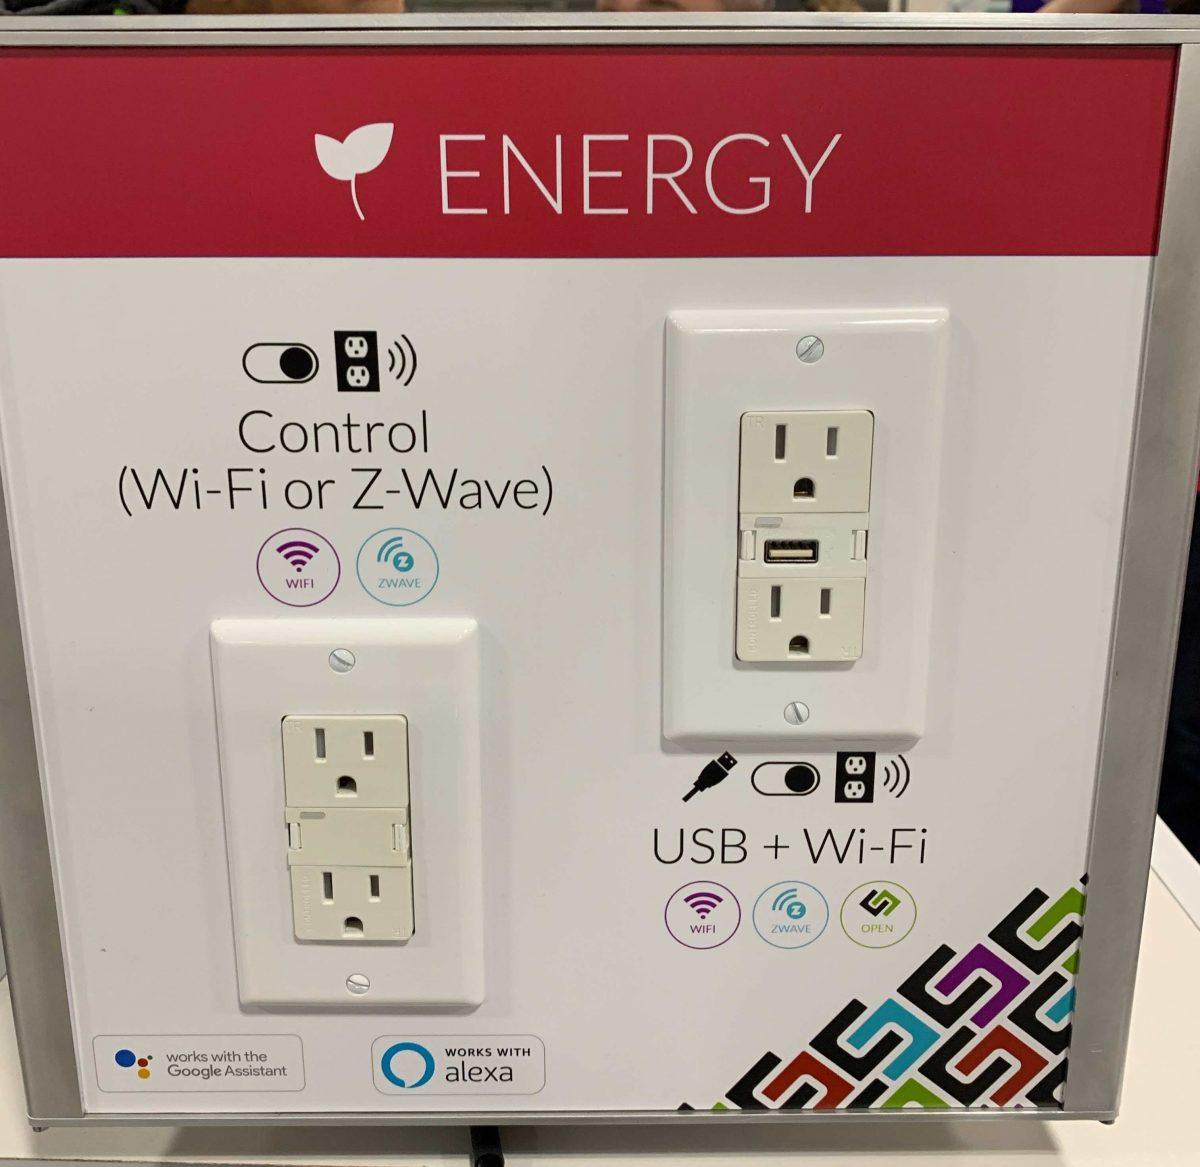 Swidget Modular smart Switches CES smart home gadget